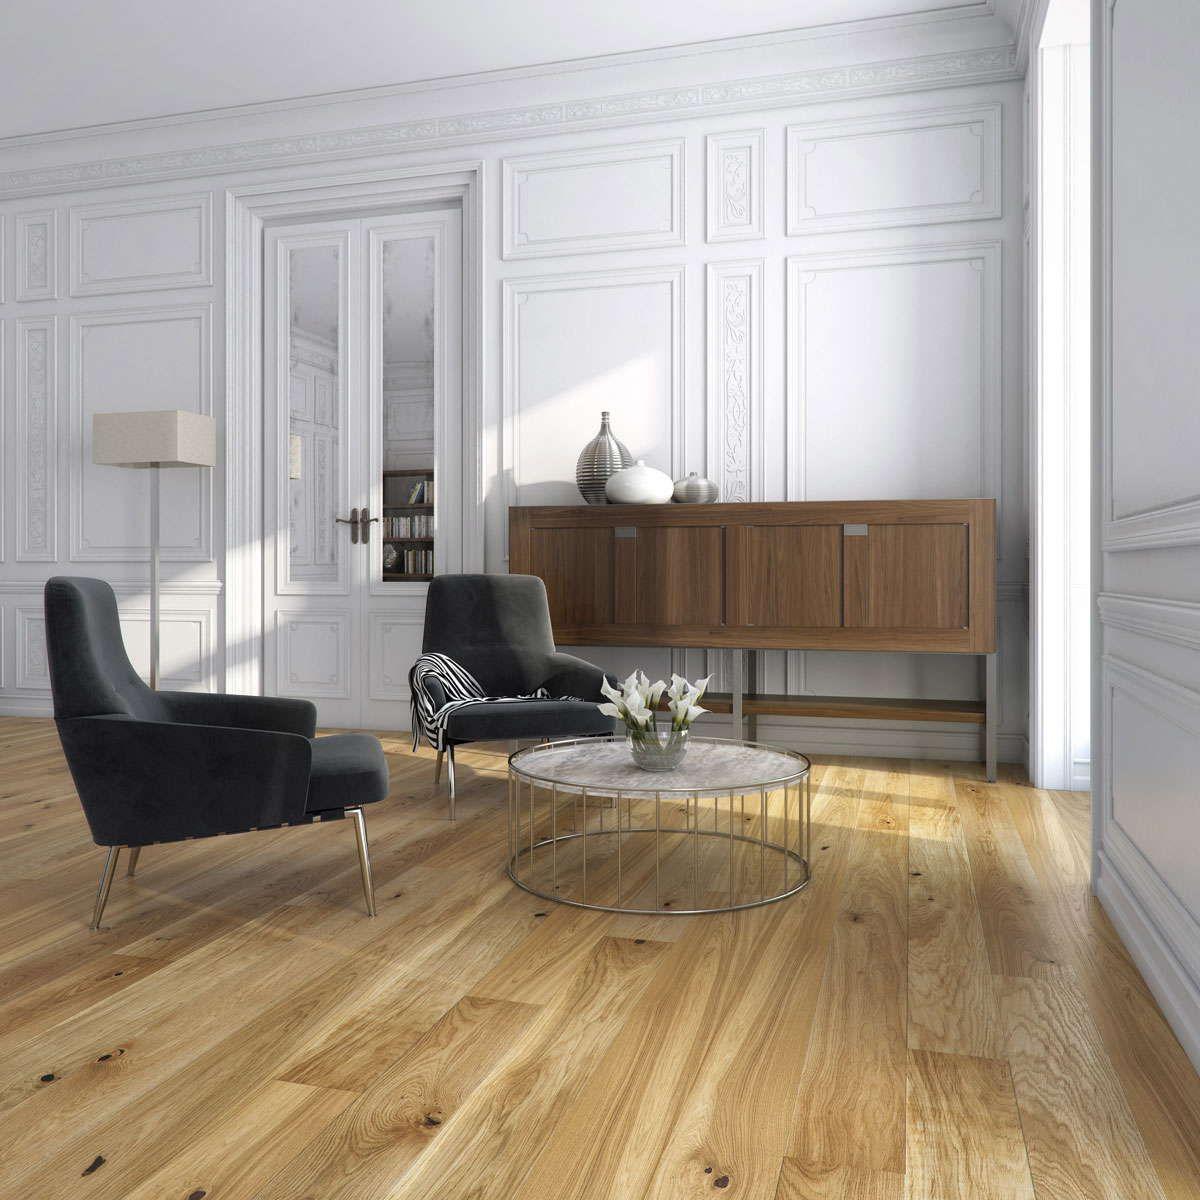 Natura Belfast Engineered Oak Wood Flooring is an